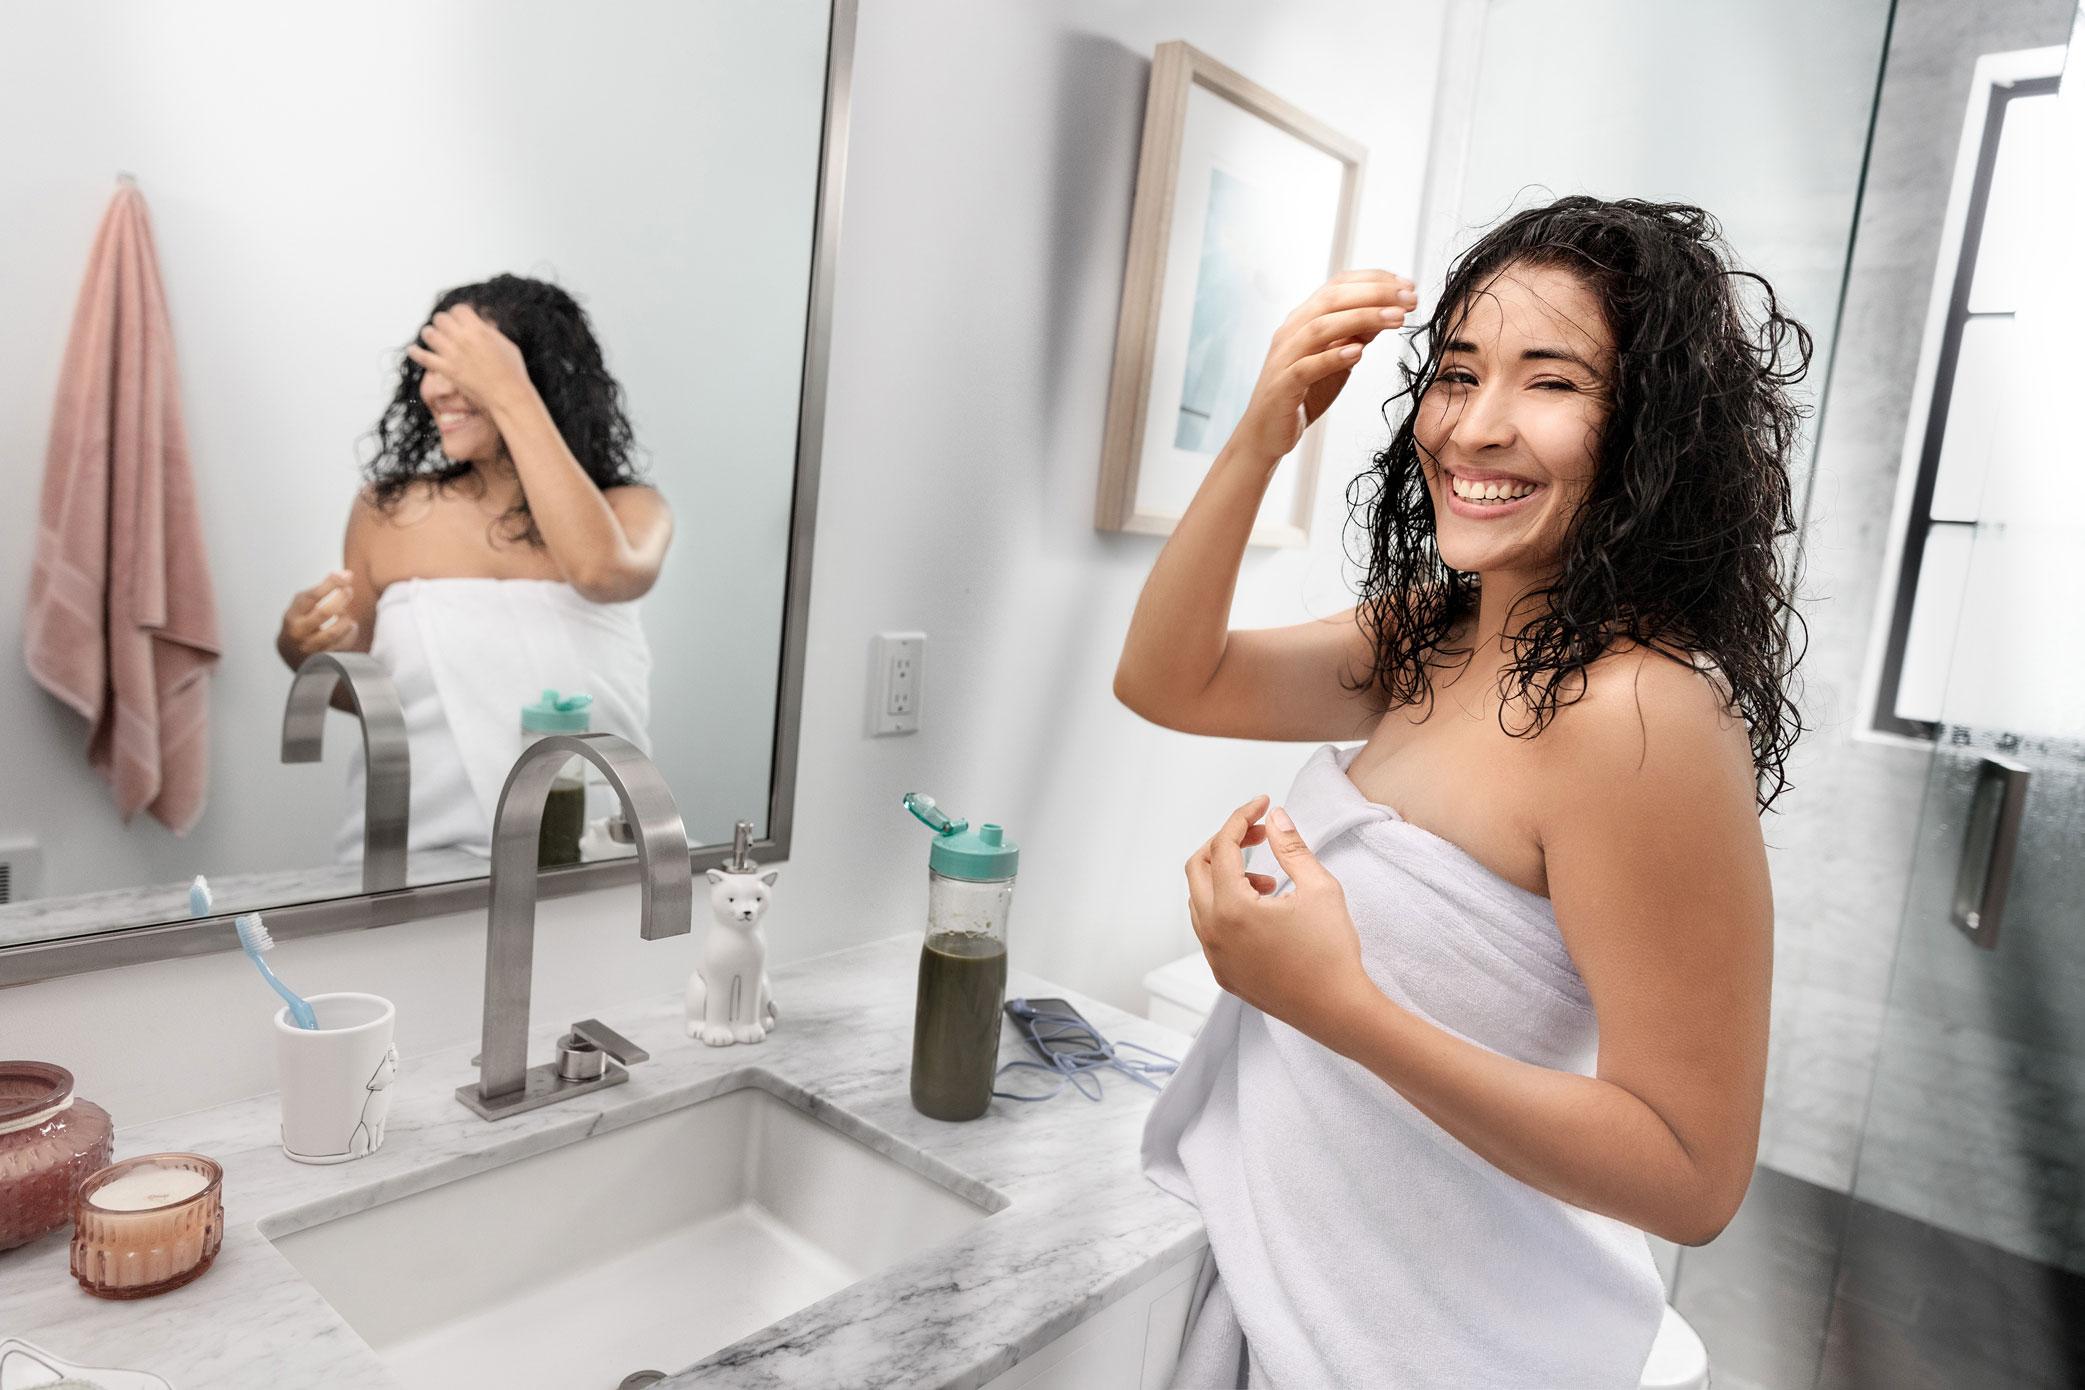 Woman Wrapped in Premium Bath Towel